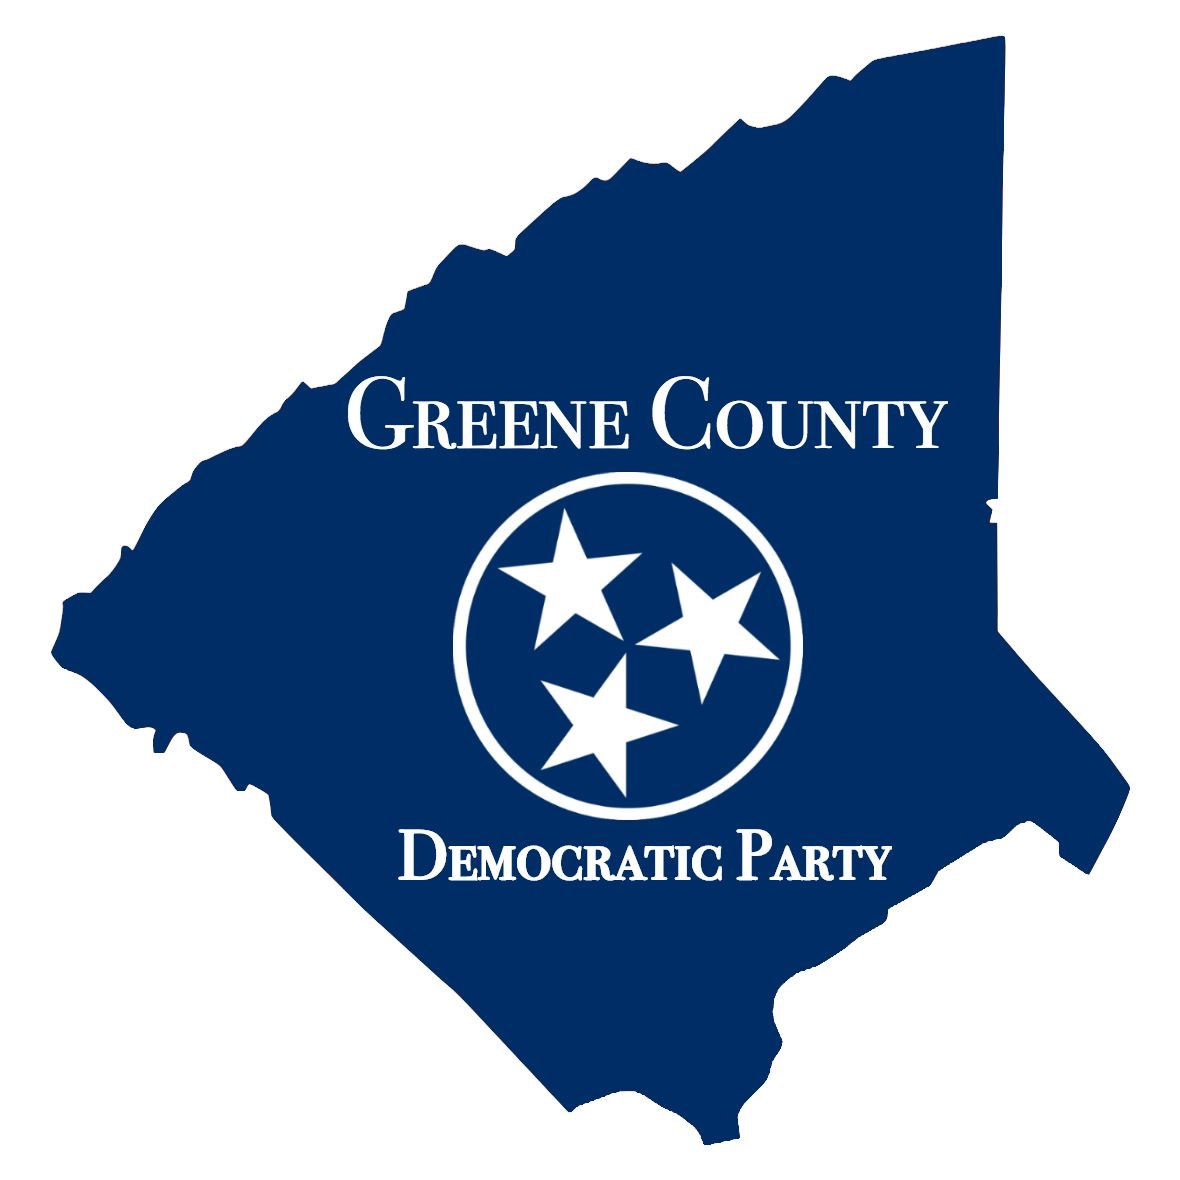 Greene County Democrat Party (TN)